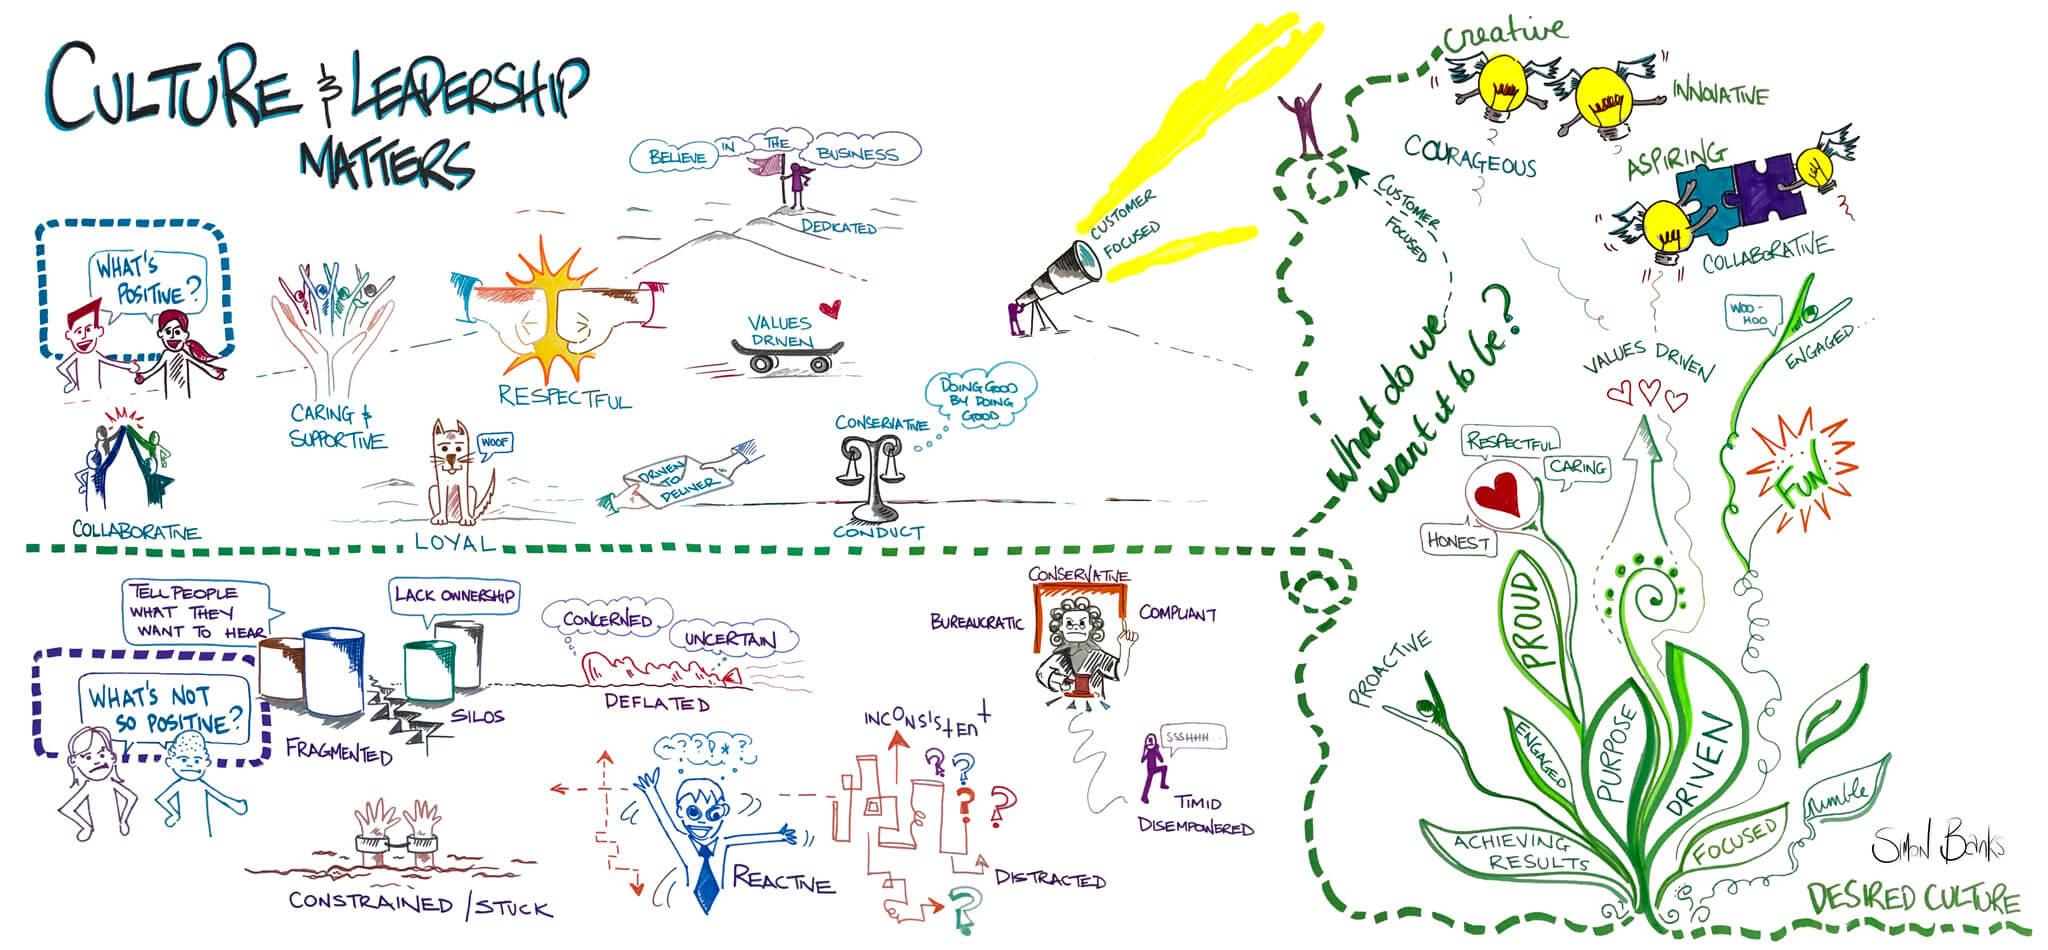 Simon Banks Graphic Facilitation Exploring Culture